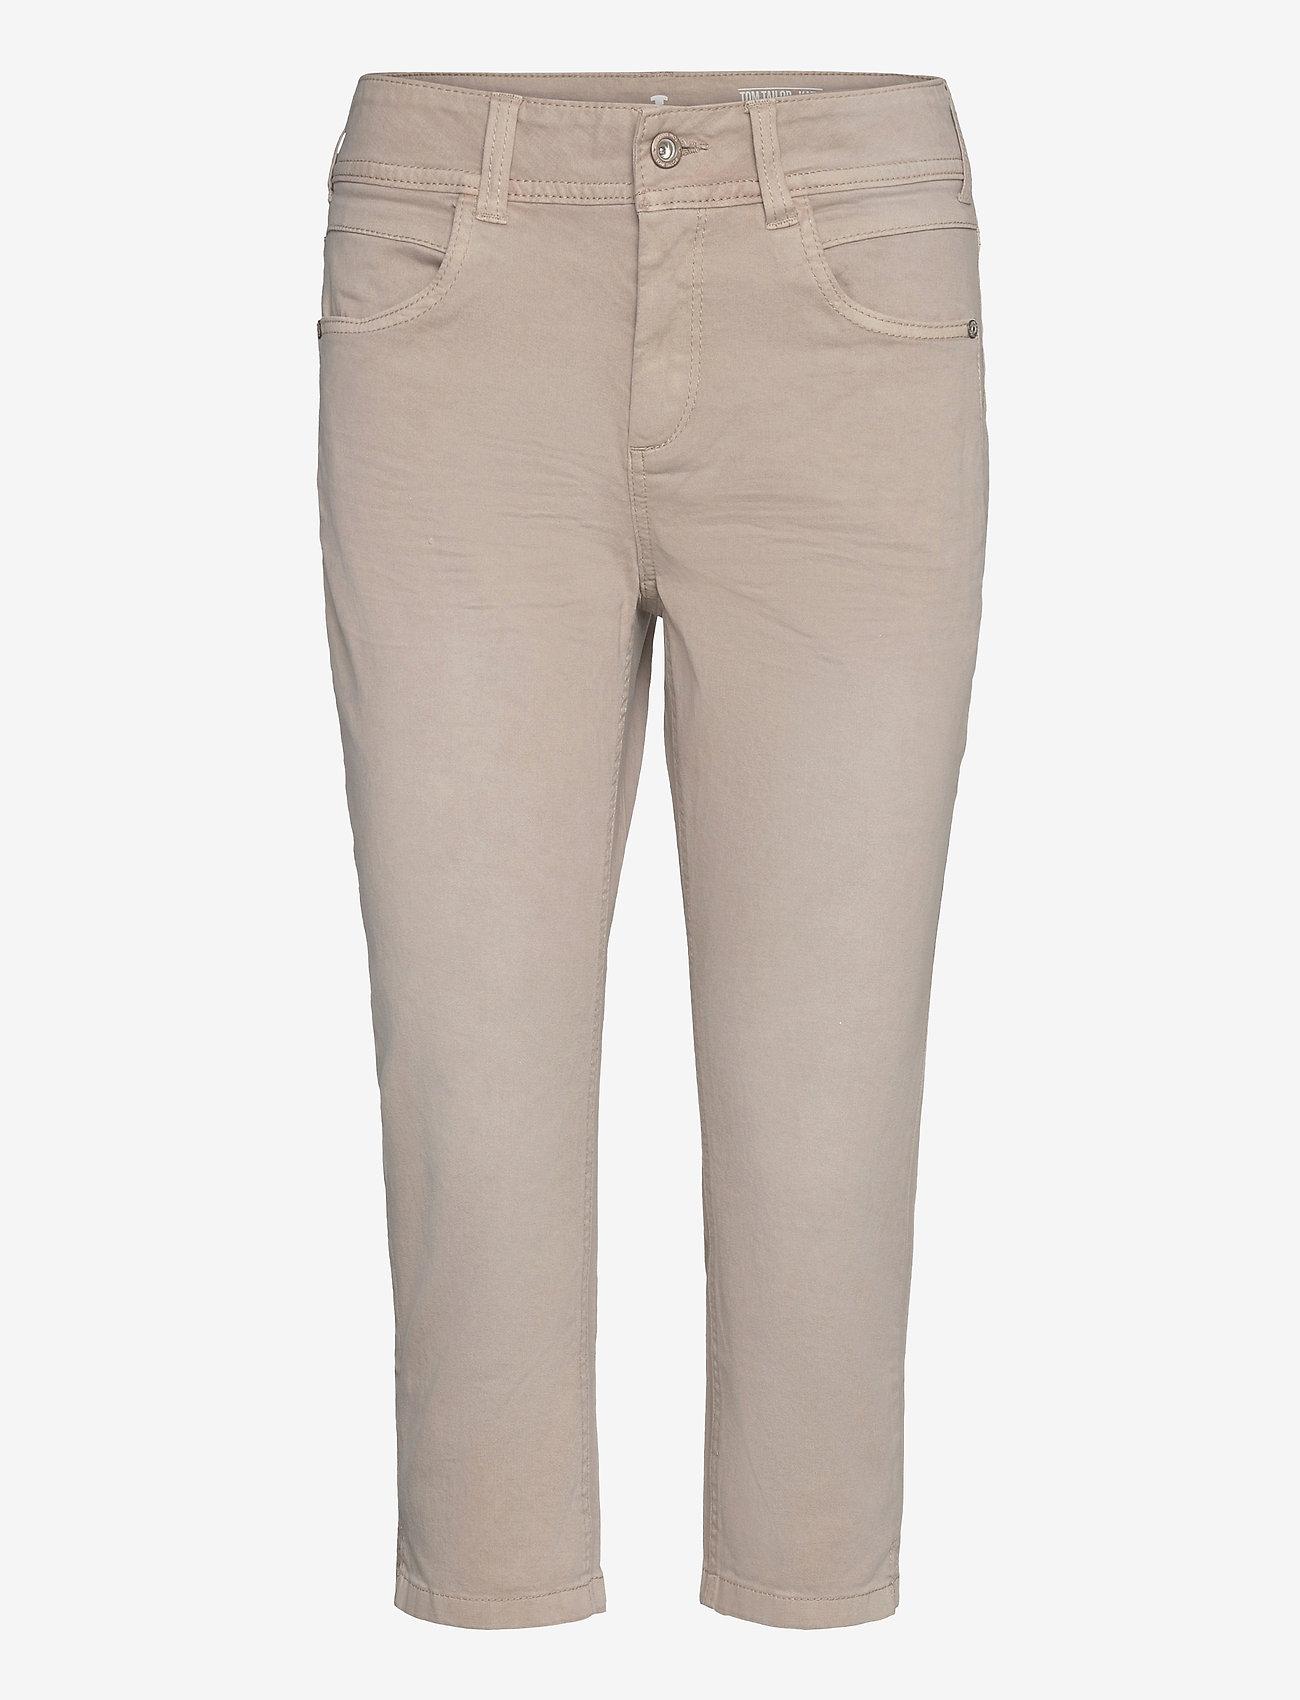 Tom Tailor - Tom Tailor K - pantalons capri - dusty taupe - 0